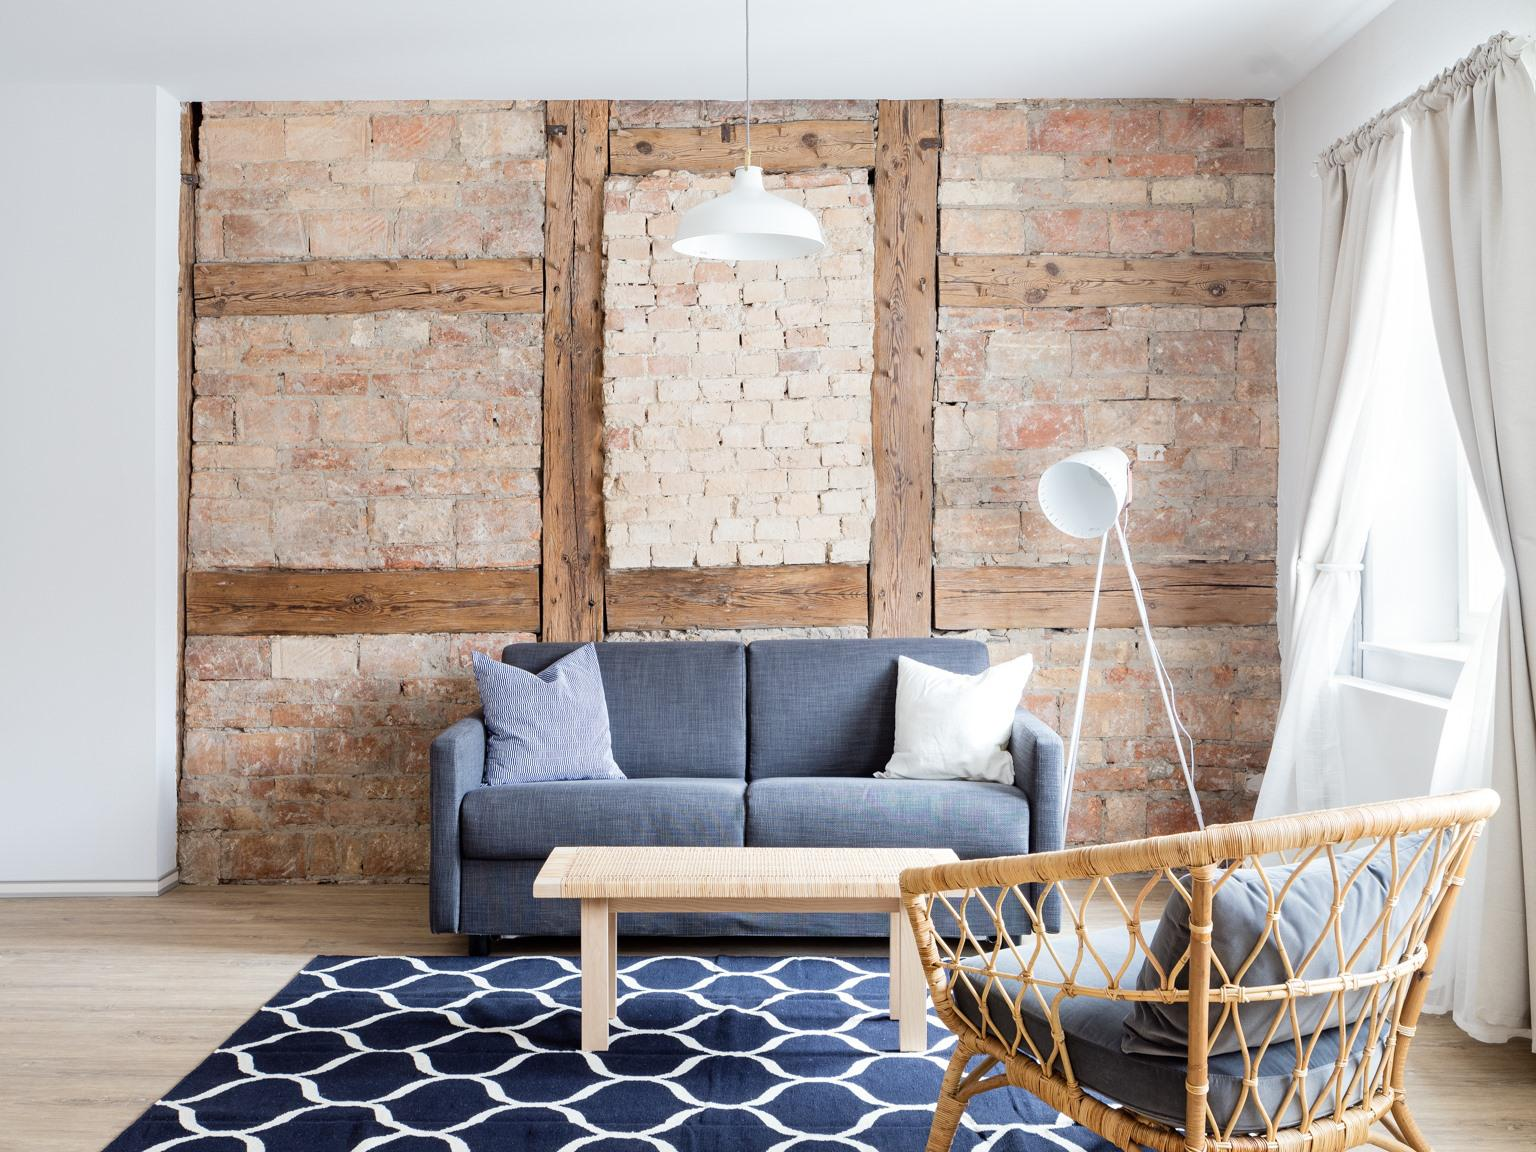 Premium-Apartment-Eigenes Badezimmer - Standardpreis